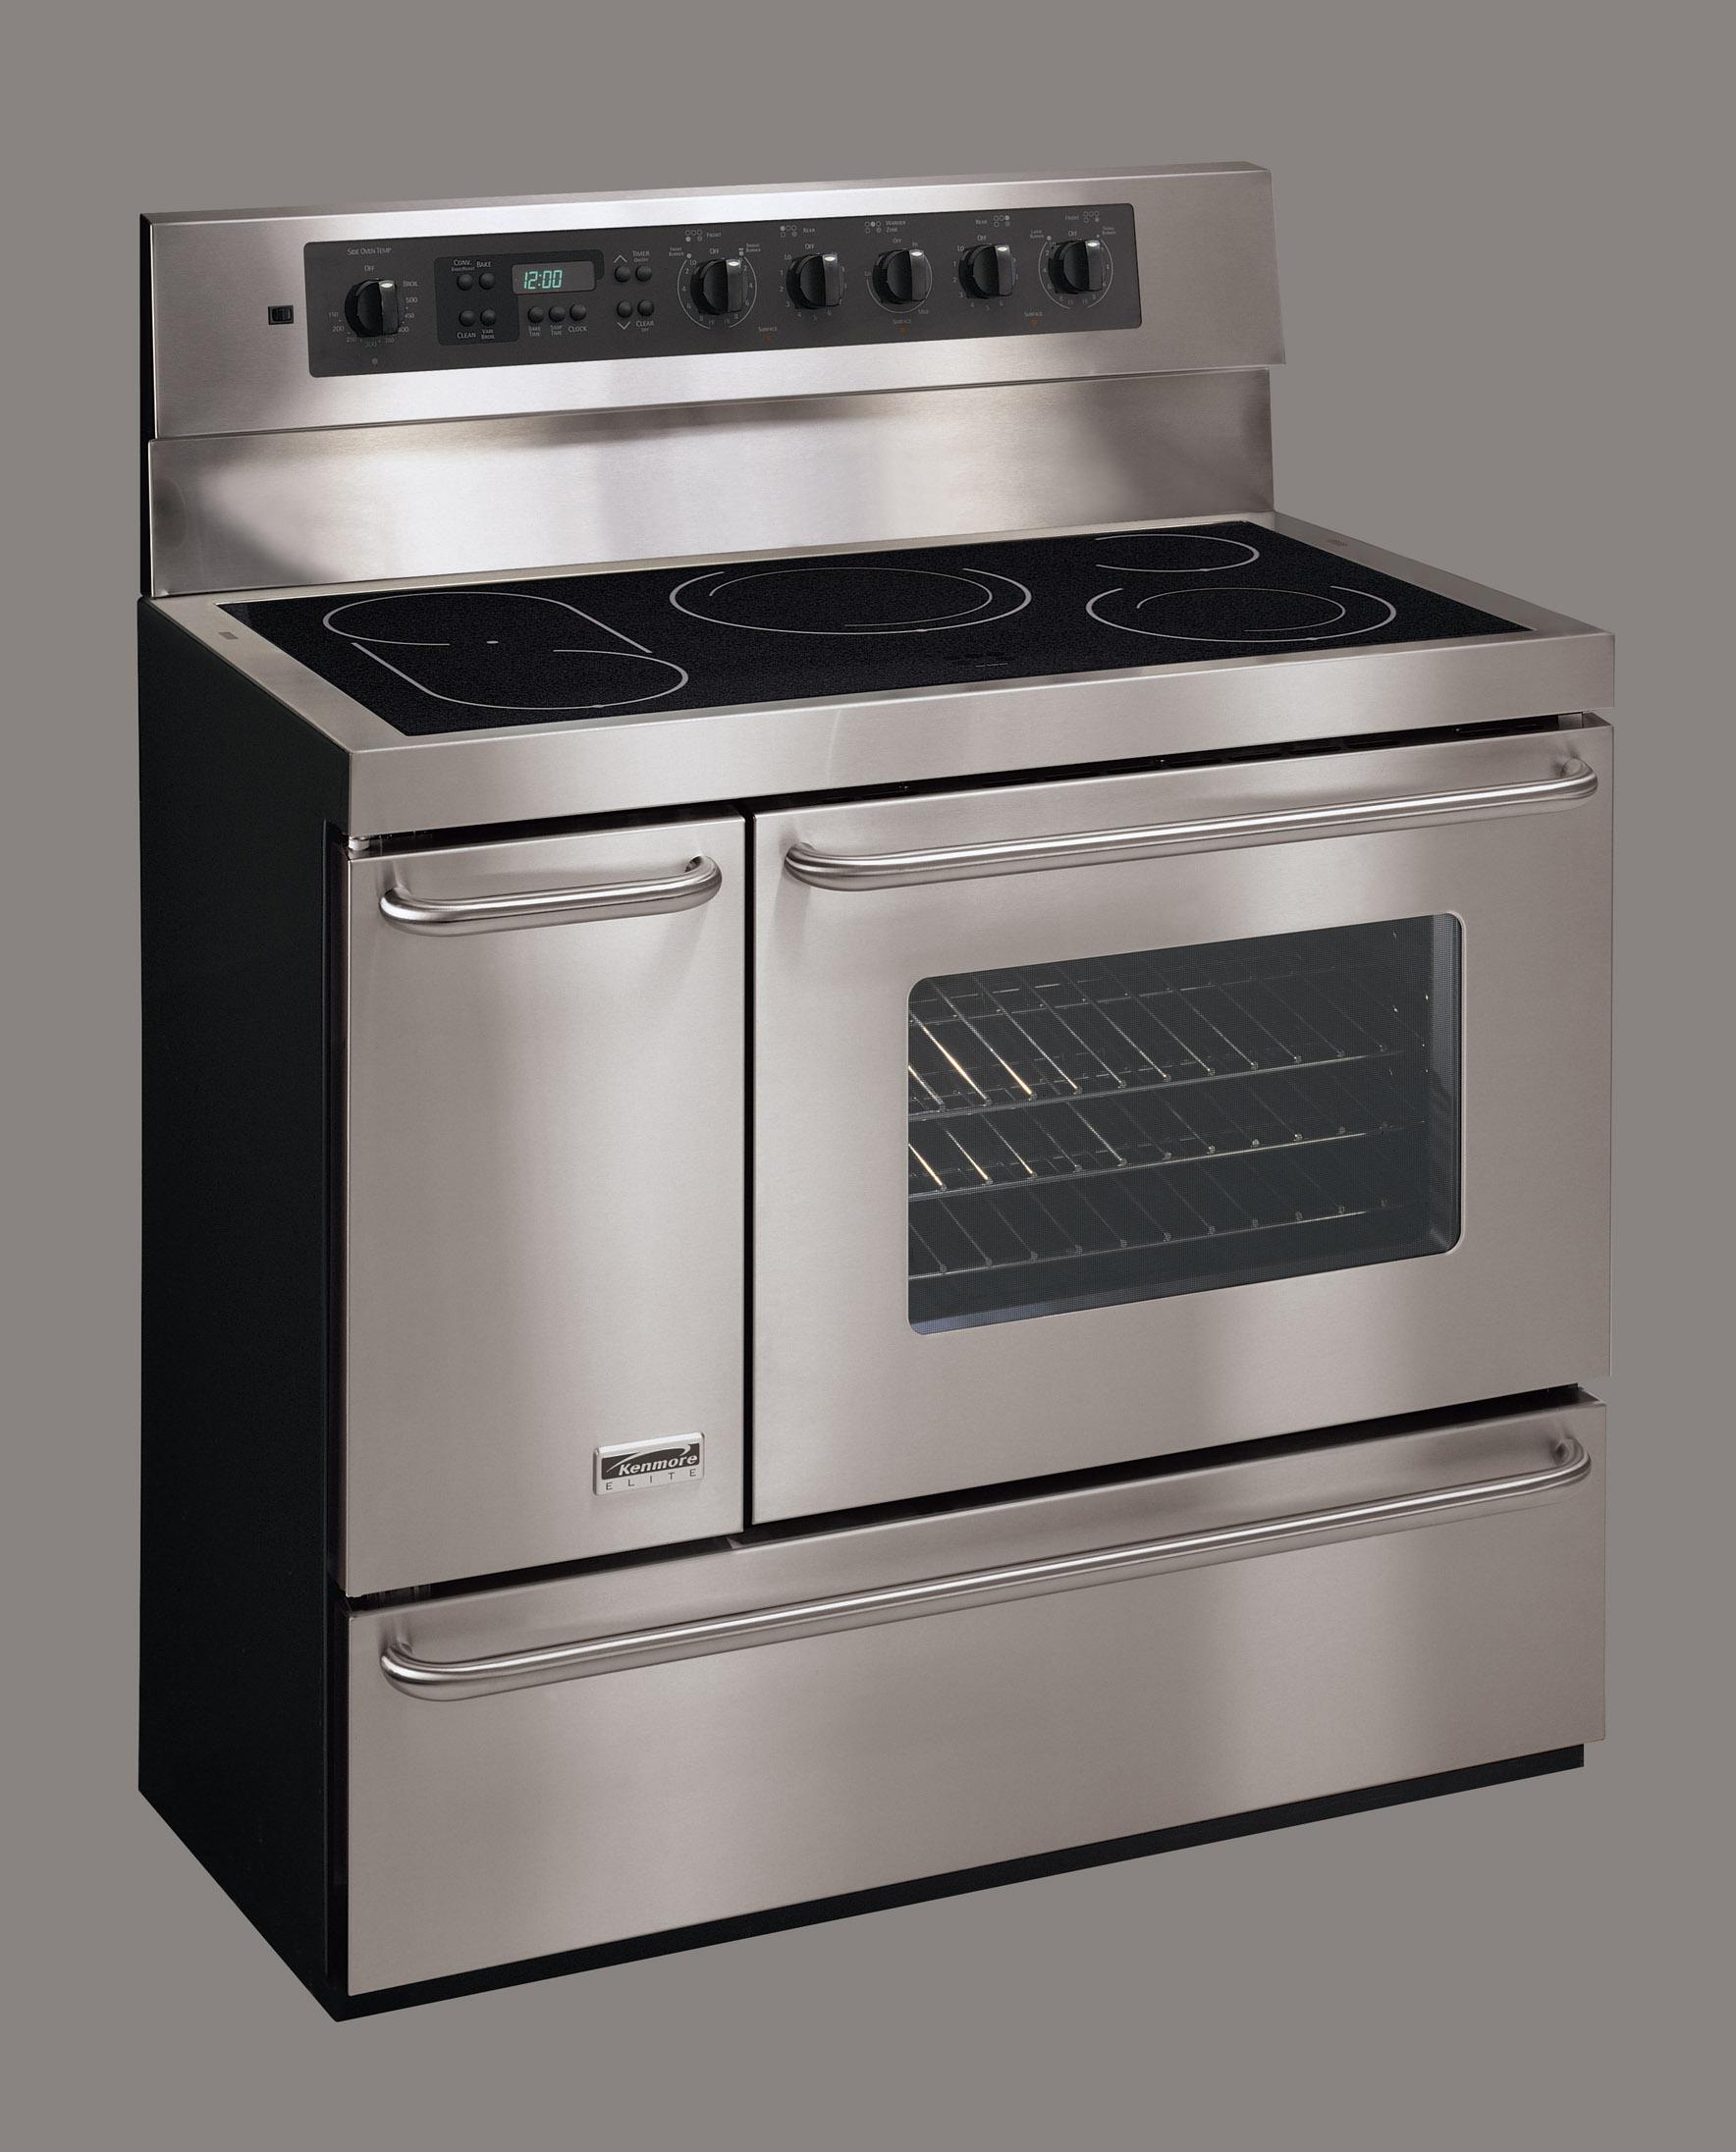 Kenmore Range/Stove/Oven Model 790.99513306 Parts